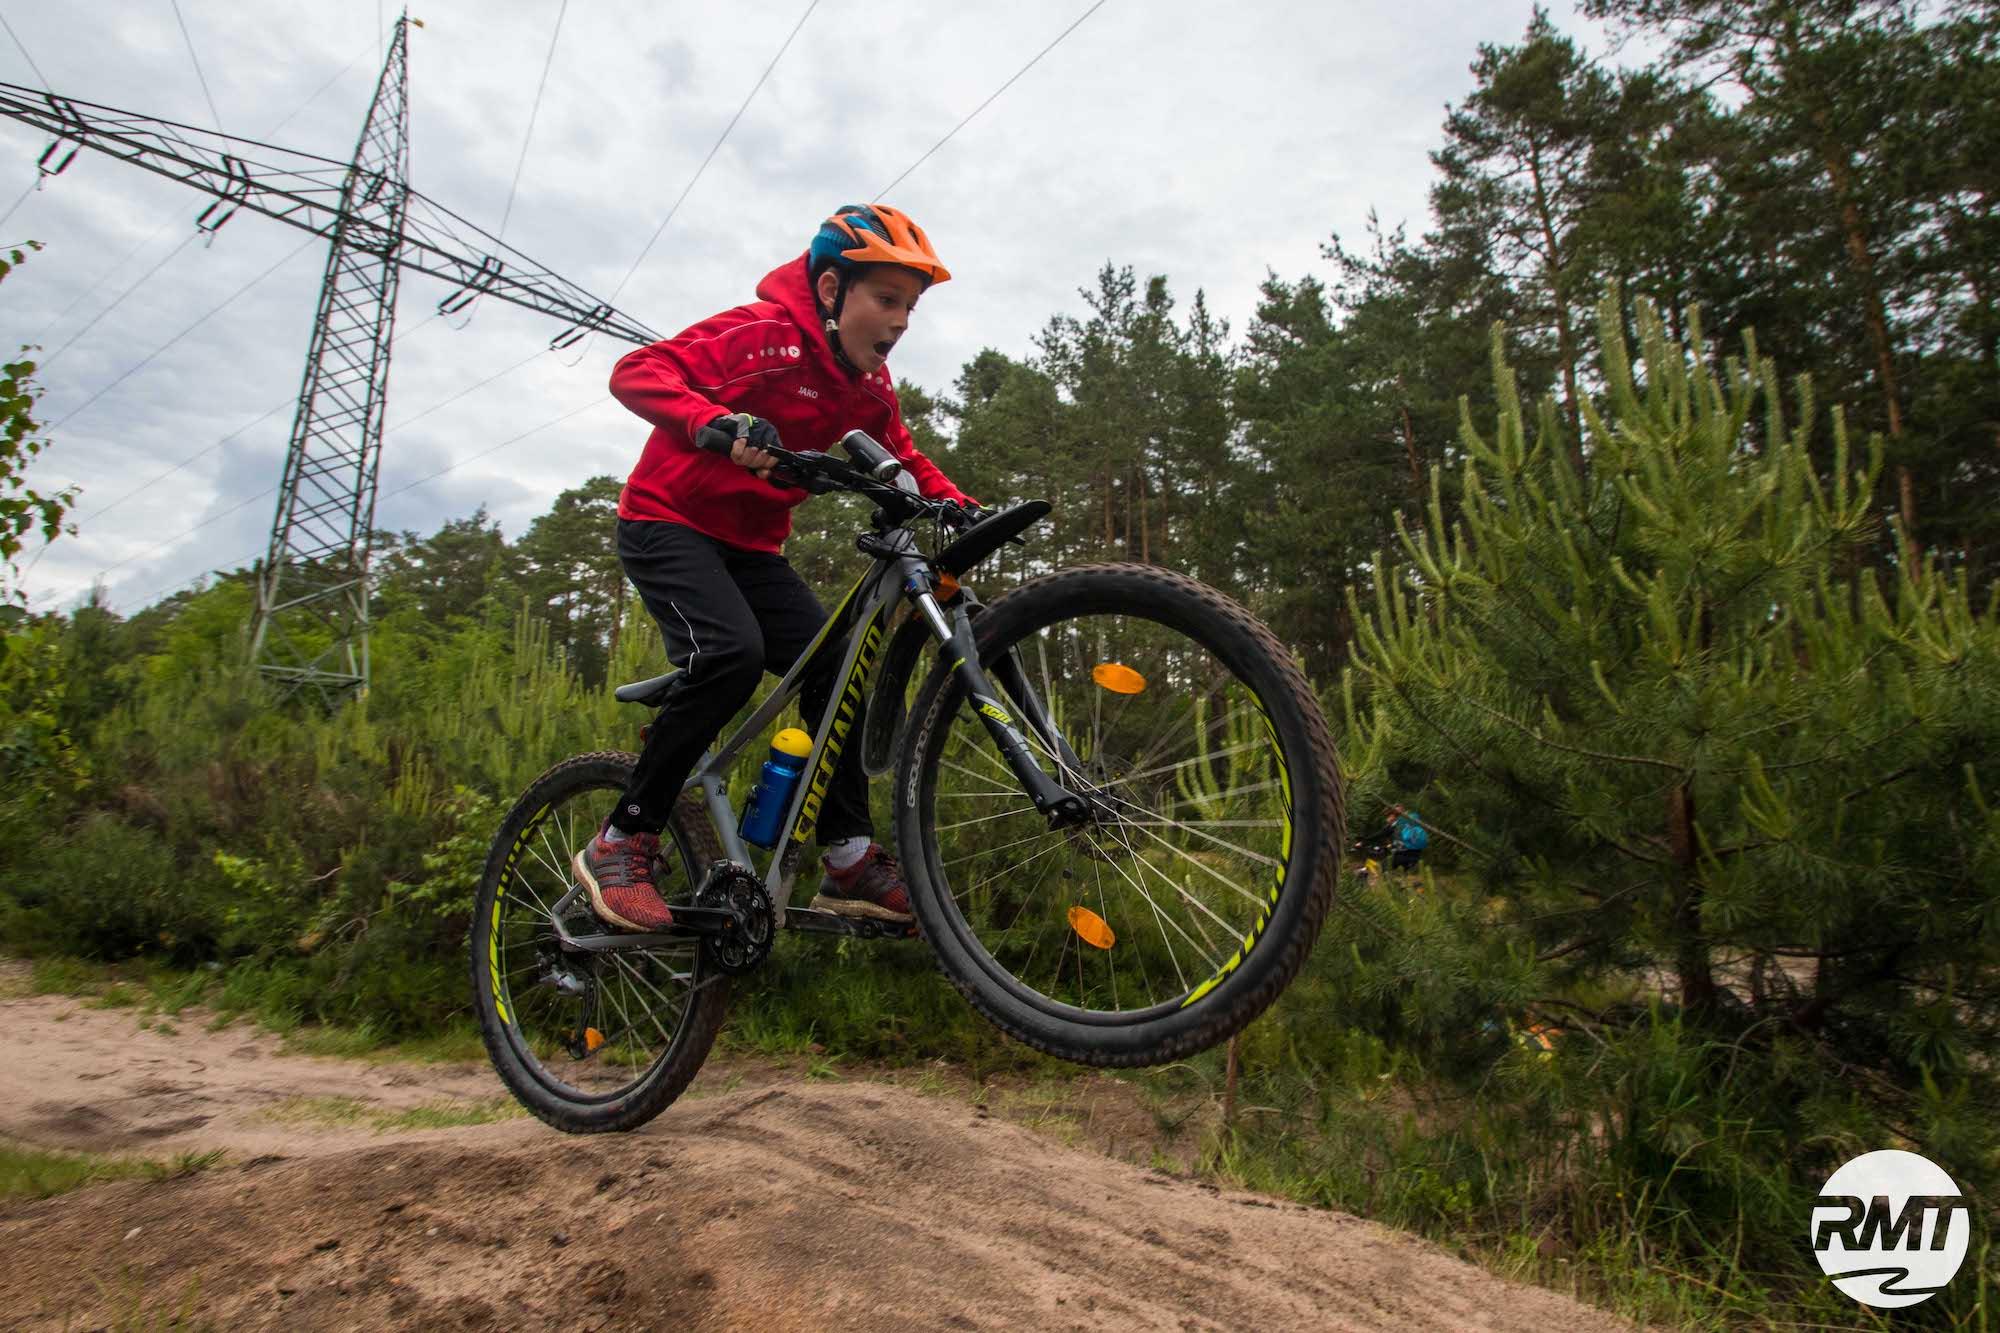 Mountainbike Kinder Kurs in Koblenz - 8-12 Jahre Kids - Rock my Trail Fahrtechnik Bikeschule